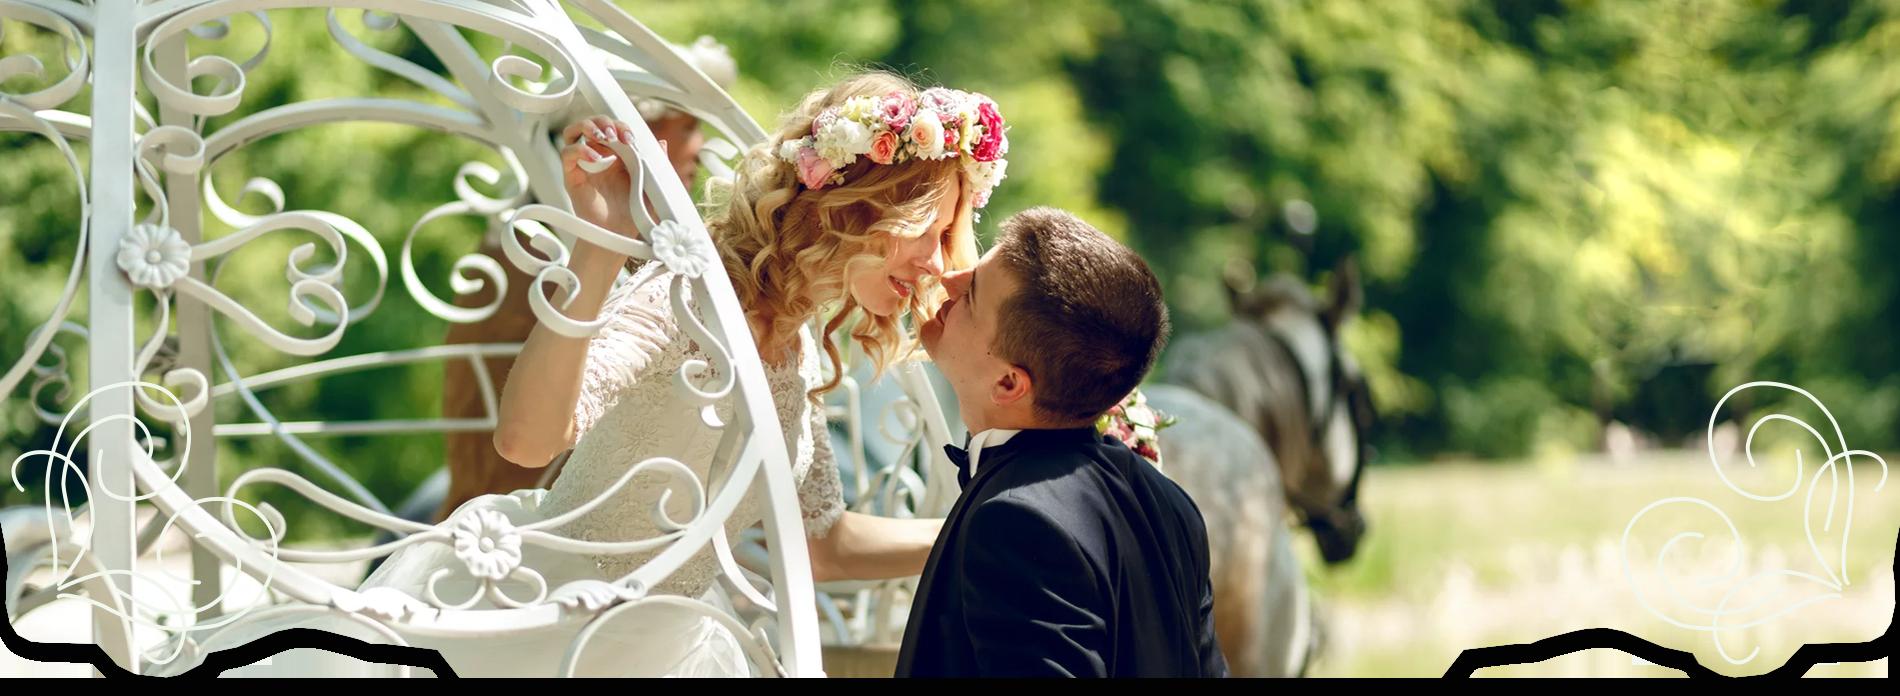 Matrimonio in Oltrepò Pavese - Eventi & Cerimonie